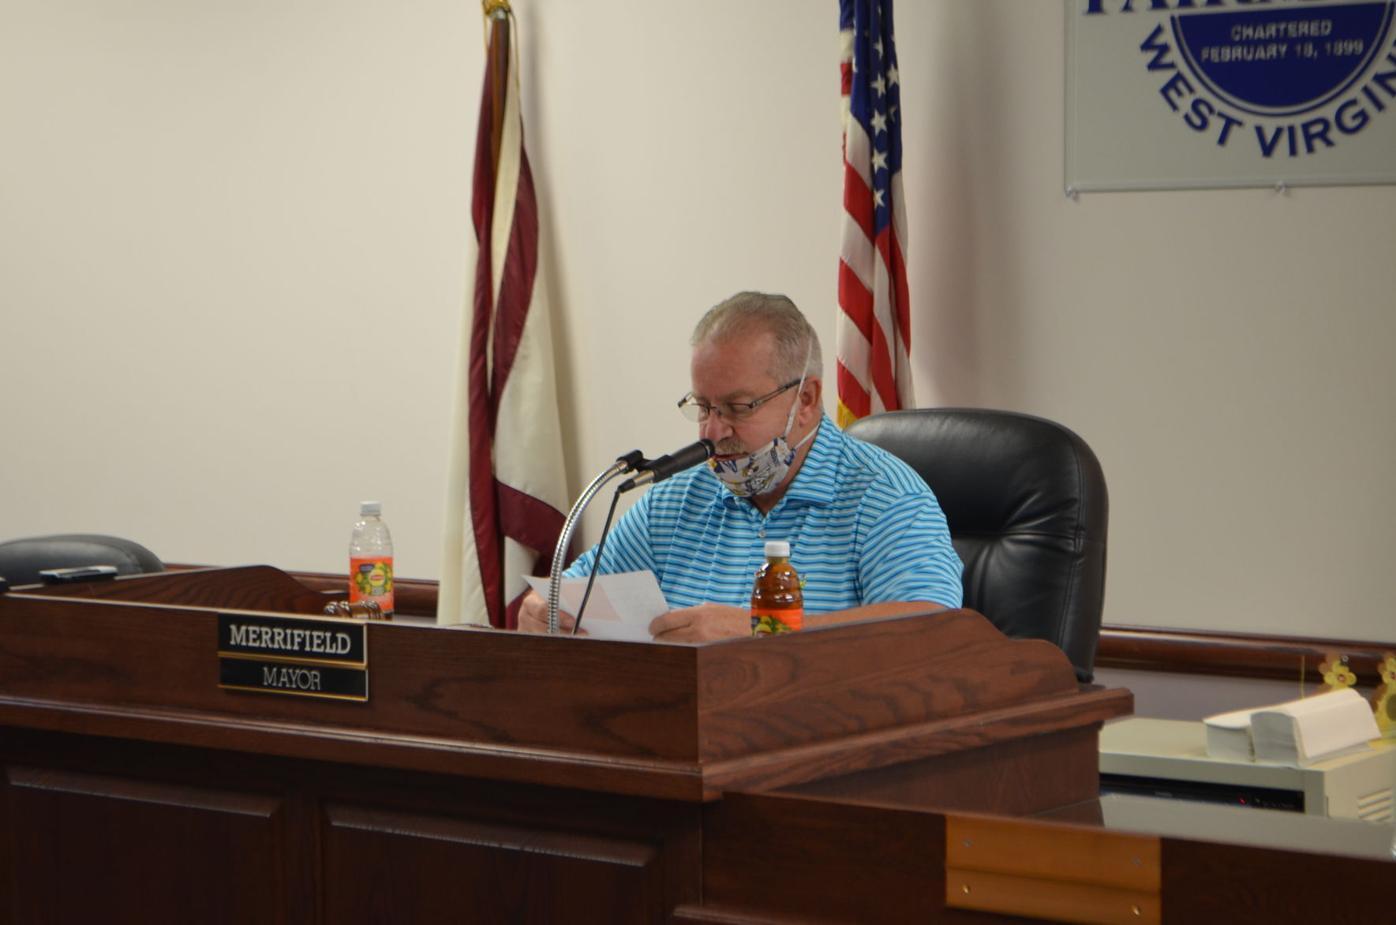 Merrifield reads Bledsoe's statement